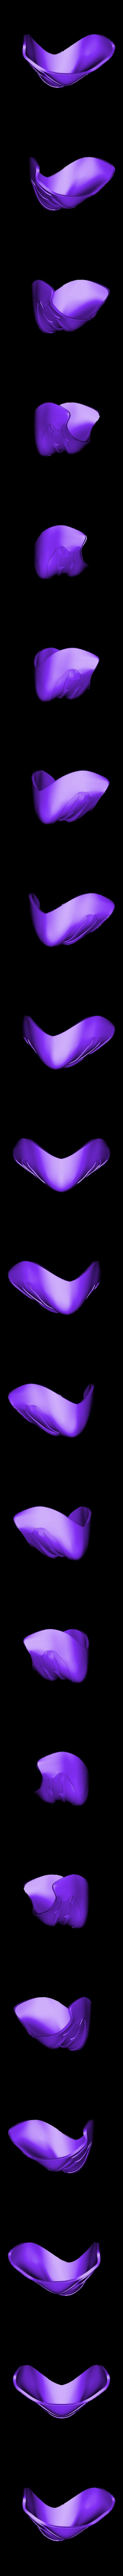 Kurasame_Susaya_Mask_v1.stl Download free STL file Kurasame Susaya Mask (Final Fantasy) • 3D printer object, VillainousPropShop